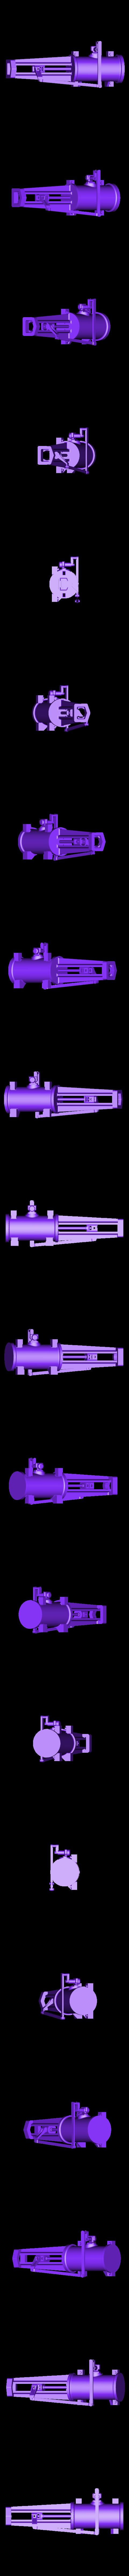 Reverse_Gear_Motor-_NO_STAND-OFF.STL Download free STL file 4-8-8-4 Big Boy Locomotive • 3D printer object, RaymondDeLuca